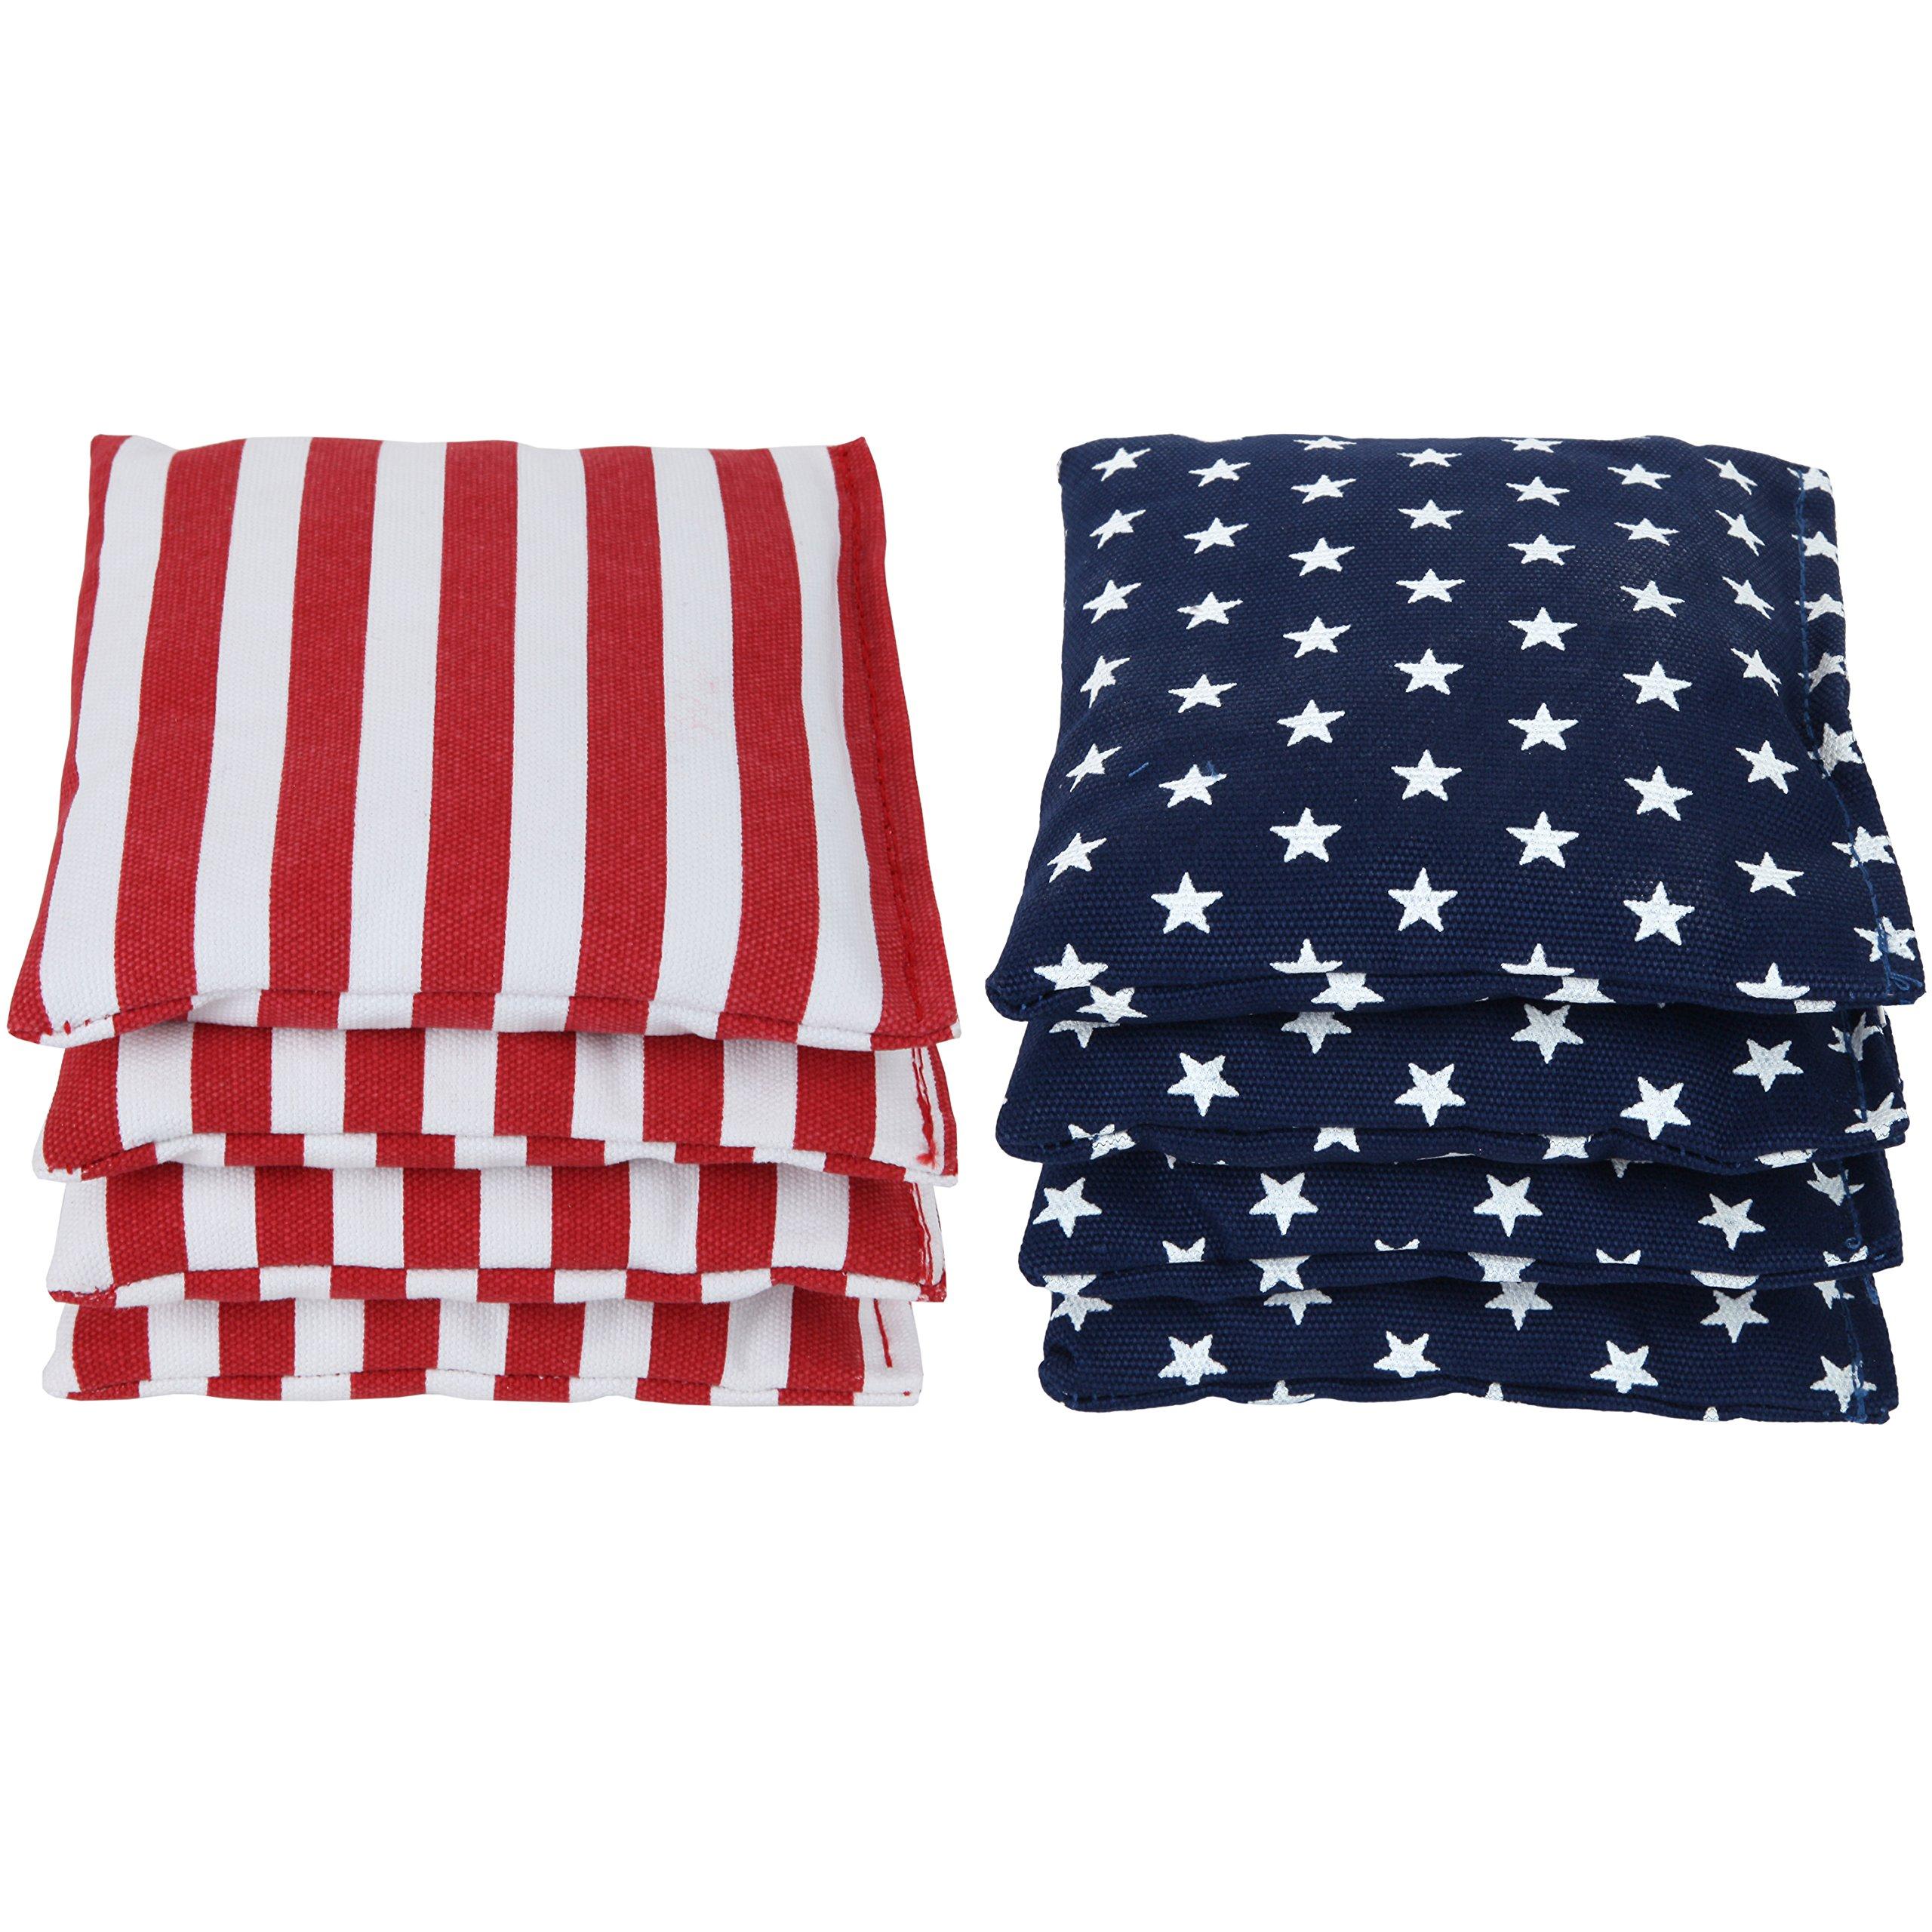 Weather Resistant Cornhole Bags (Set of 8) by SC Cornhole:: Choose Your Colors (Stars/Stripes) by SC Cornhole Games